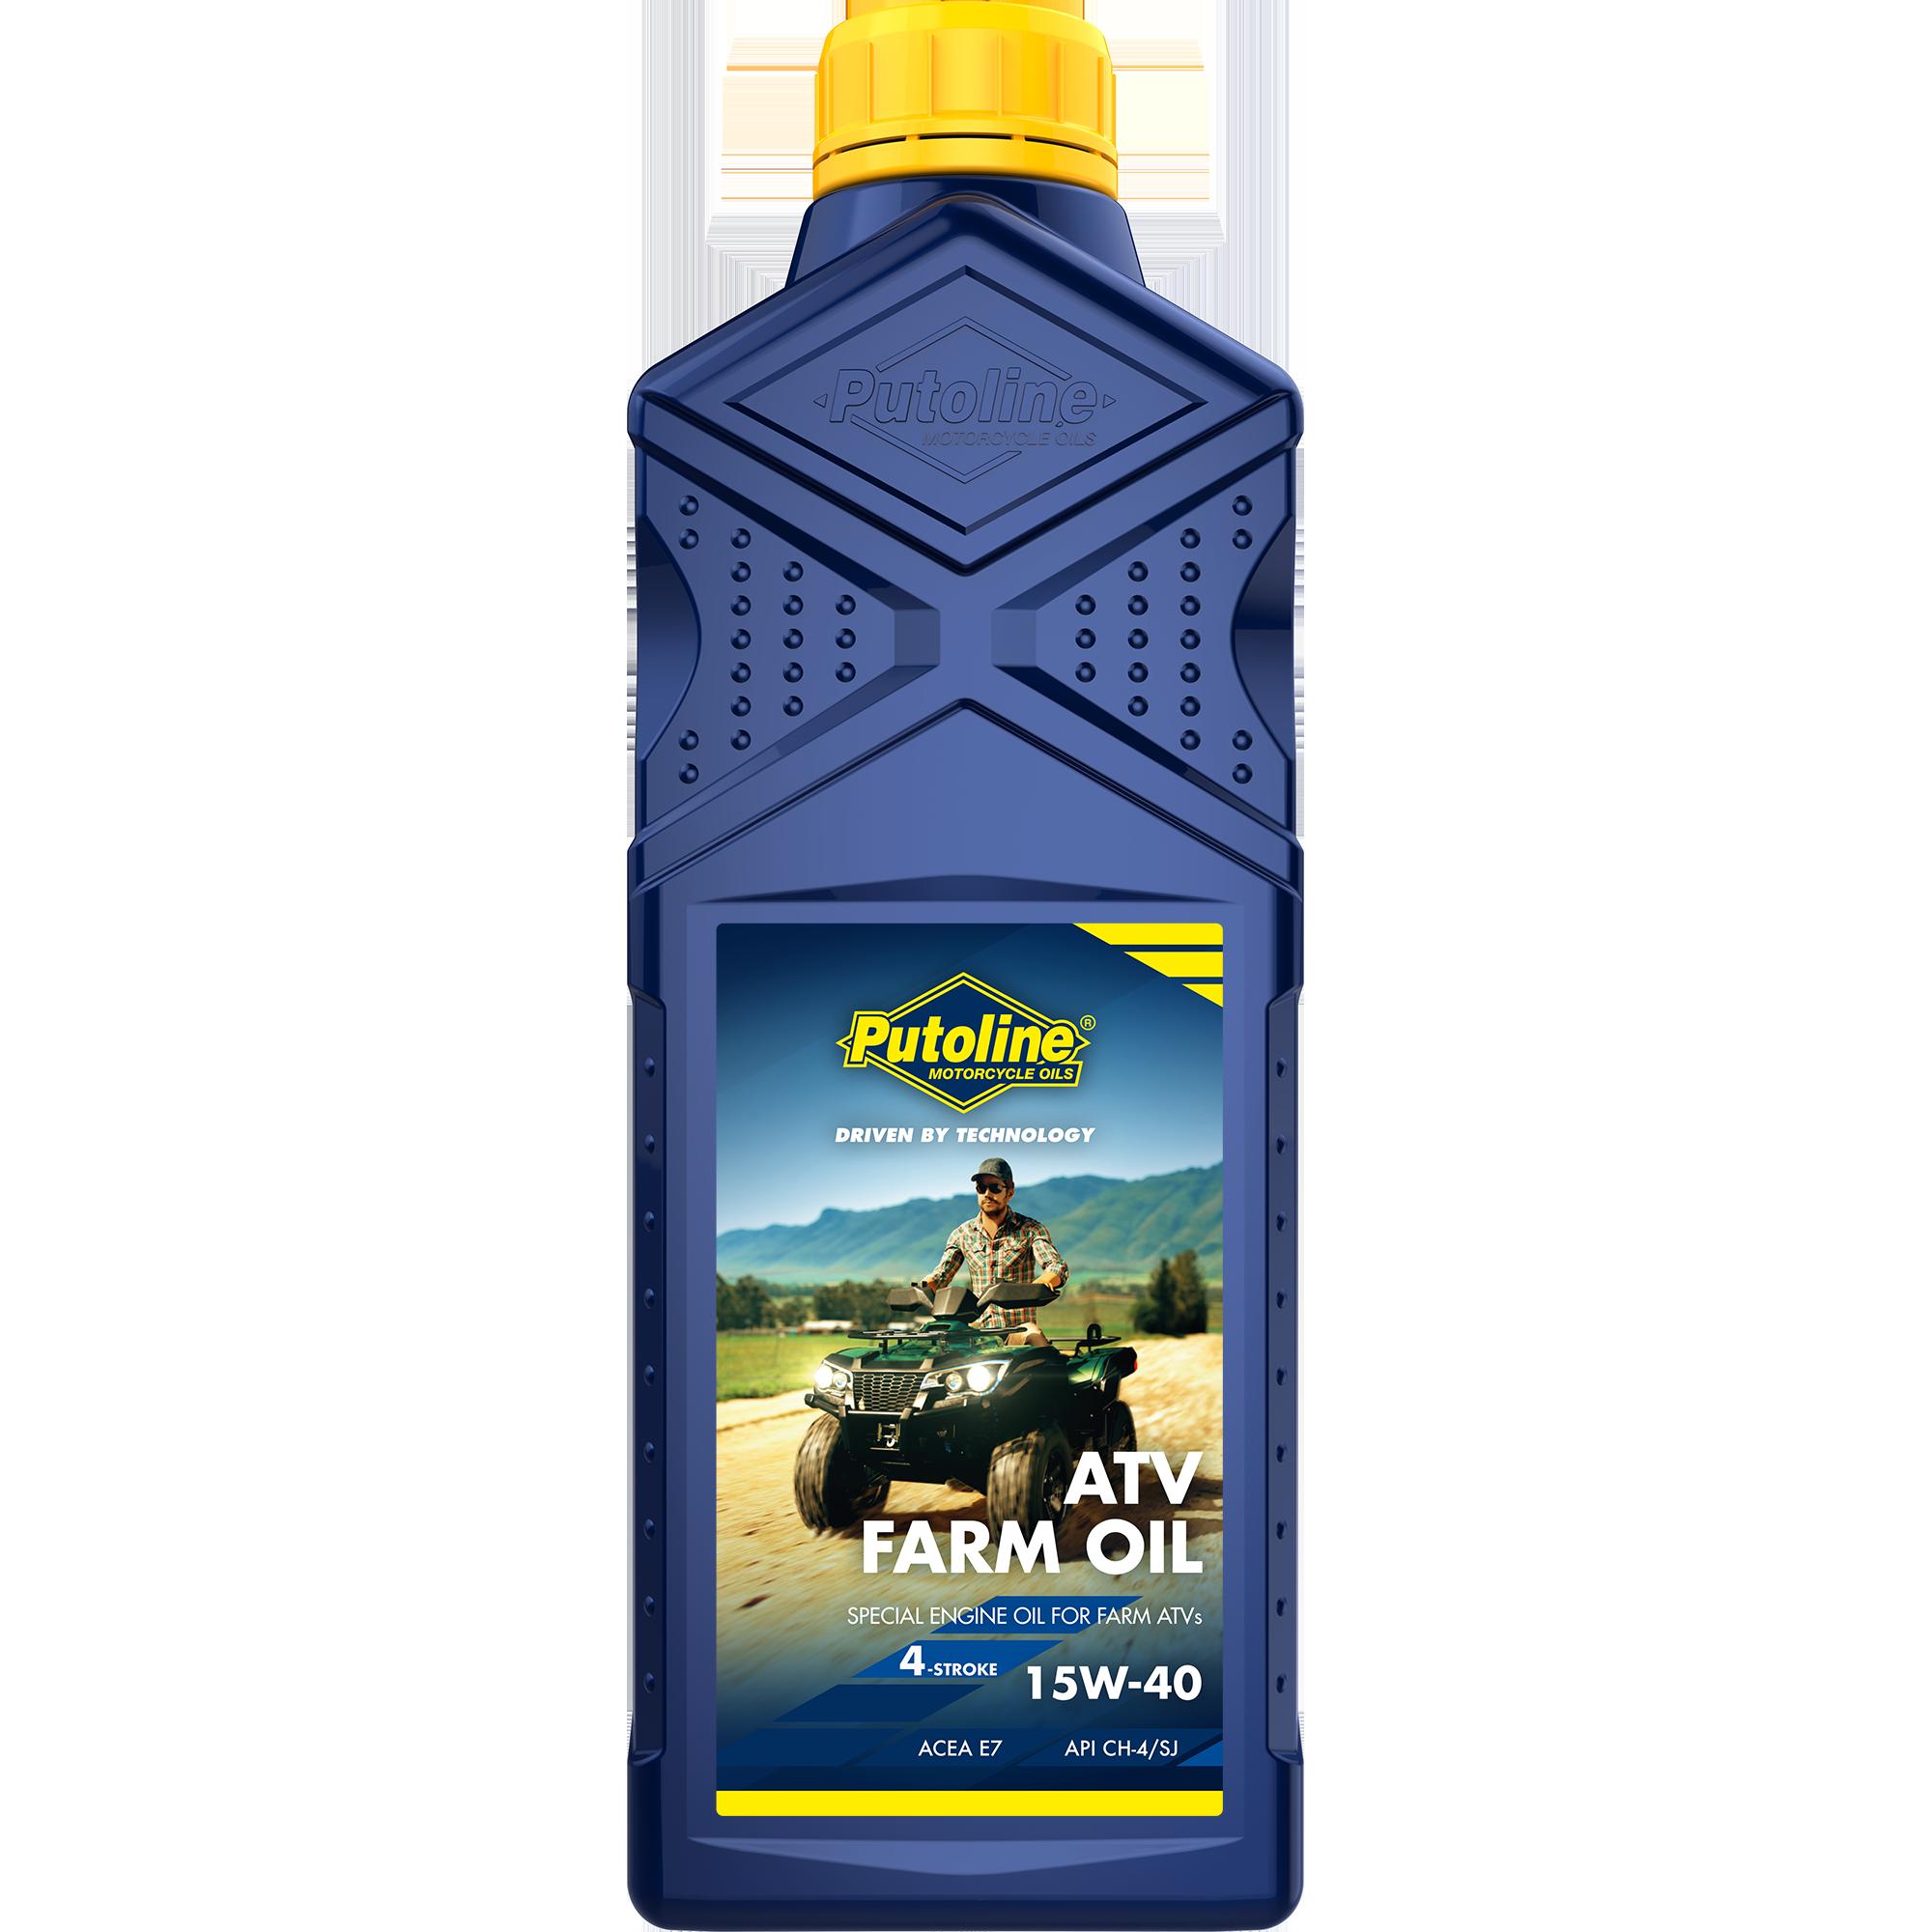 Putoline Motoröl ATV Farm Oil 15W-40 1L